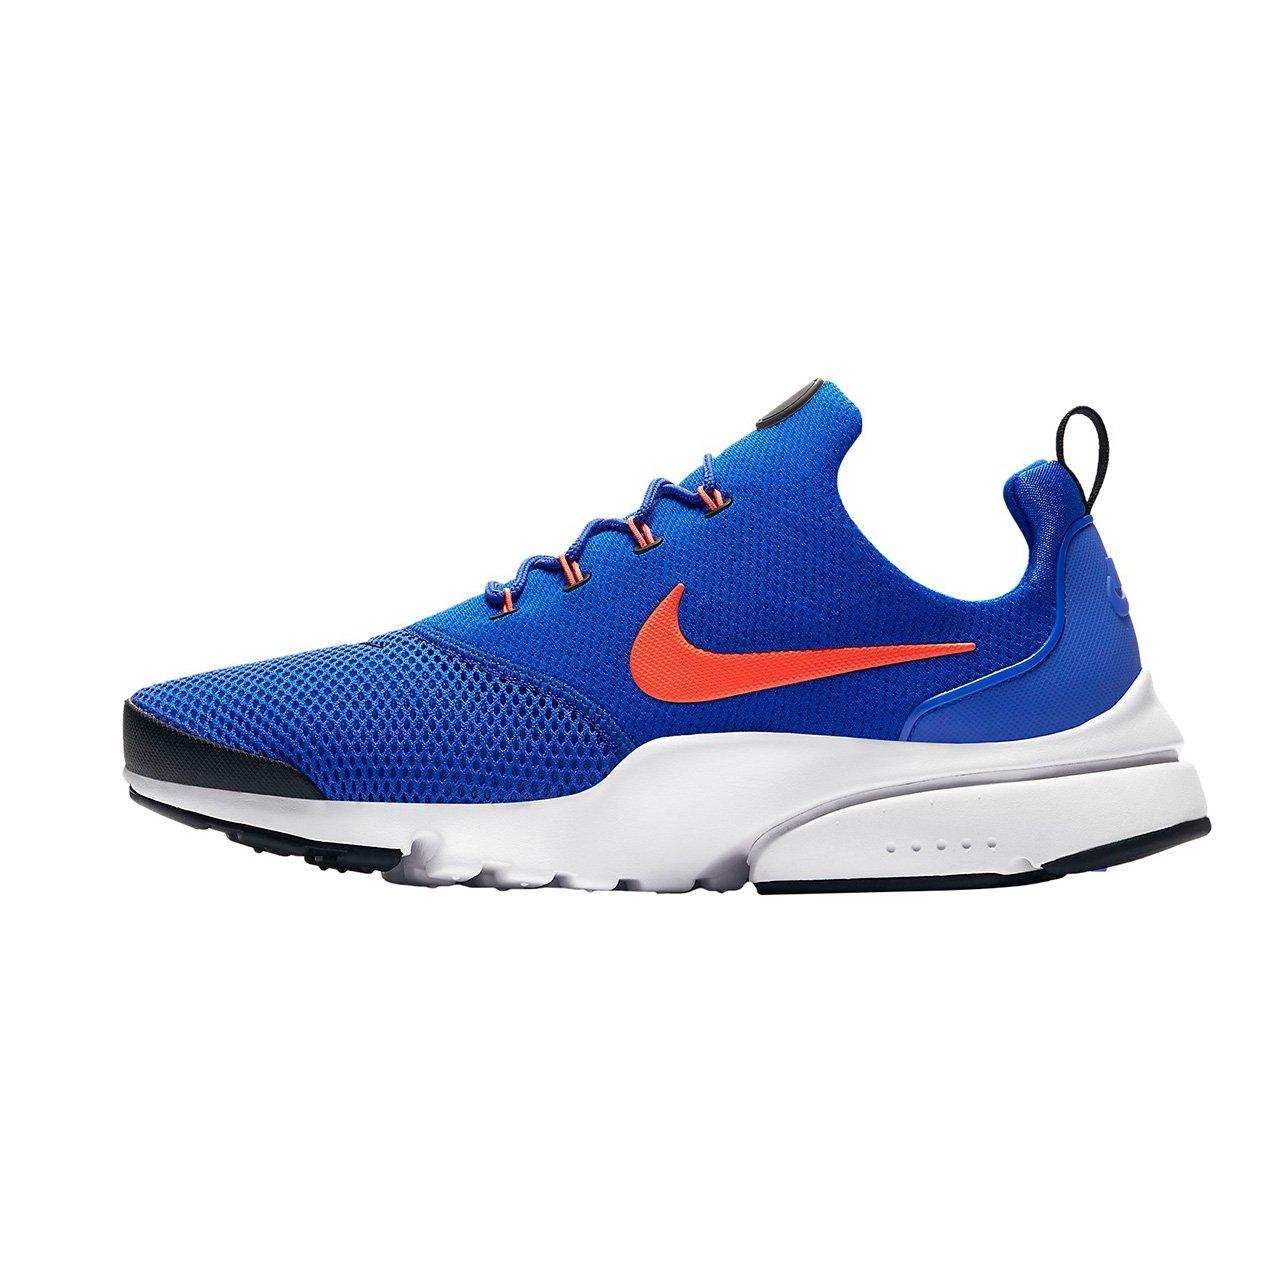 Nike Turnschuhe Low Presto Größe Fly Größe Presto 45 Blau (Blau) bd49d0